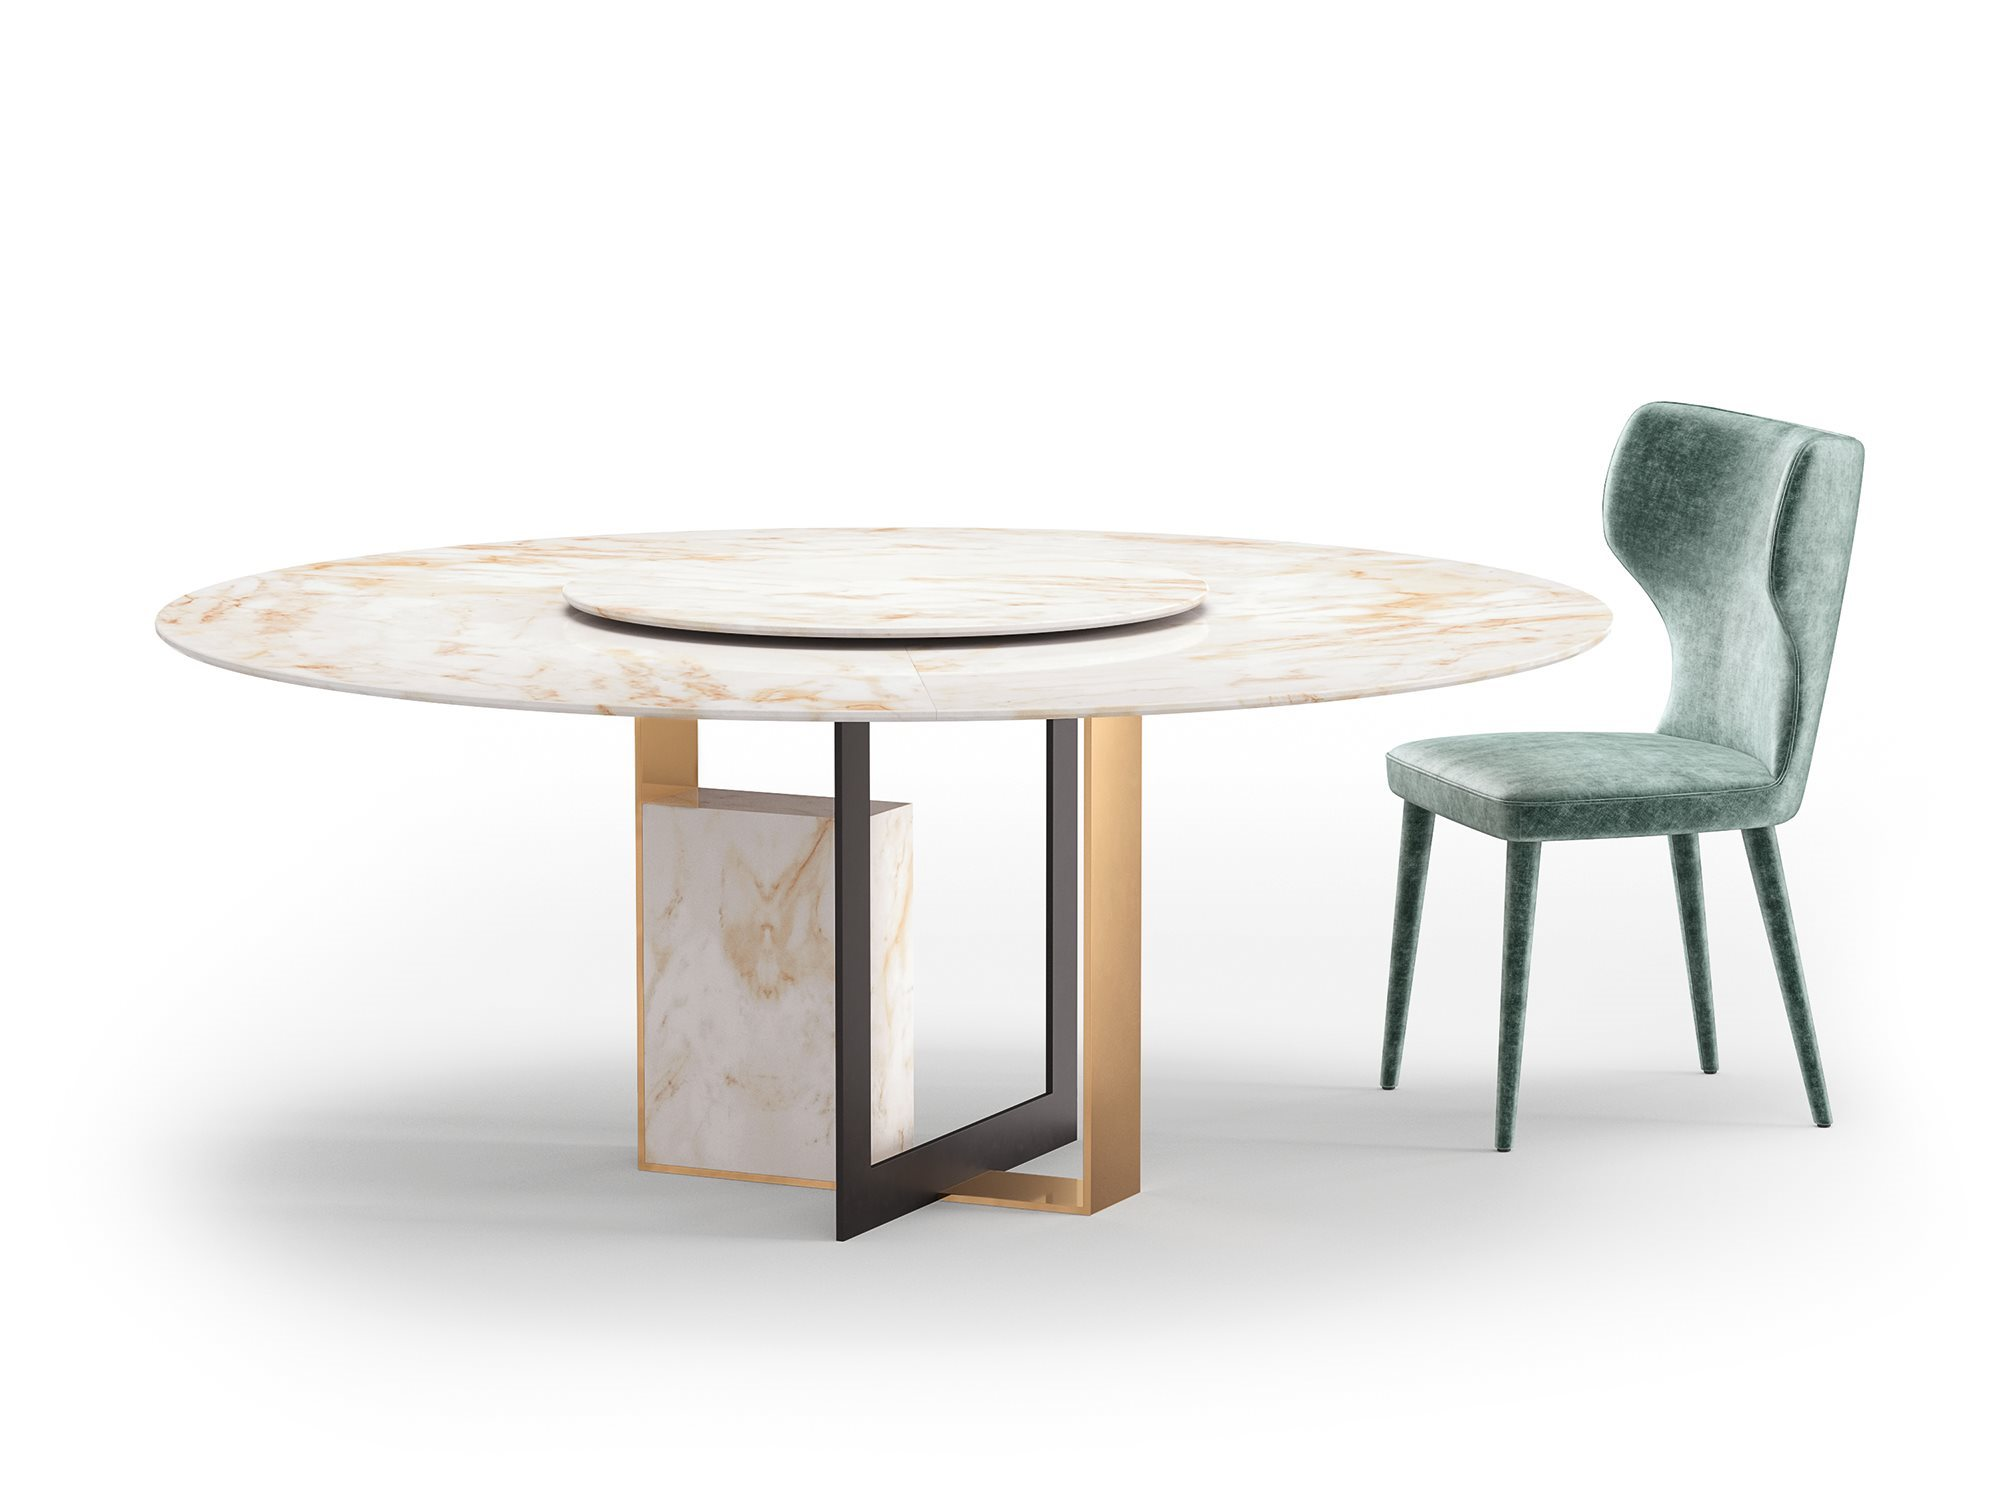 Alberta Salotti Обеденный стул Monika от итальянского бренда Alberta